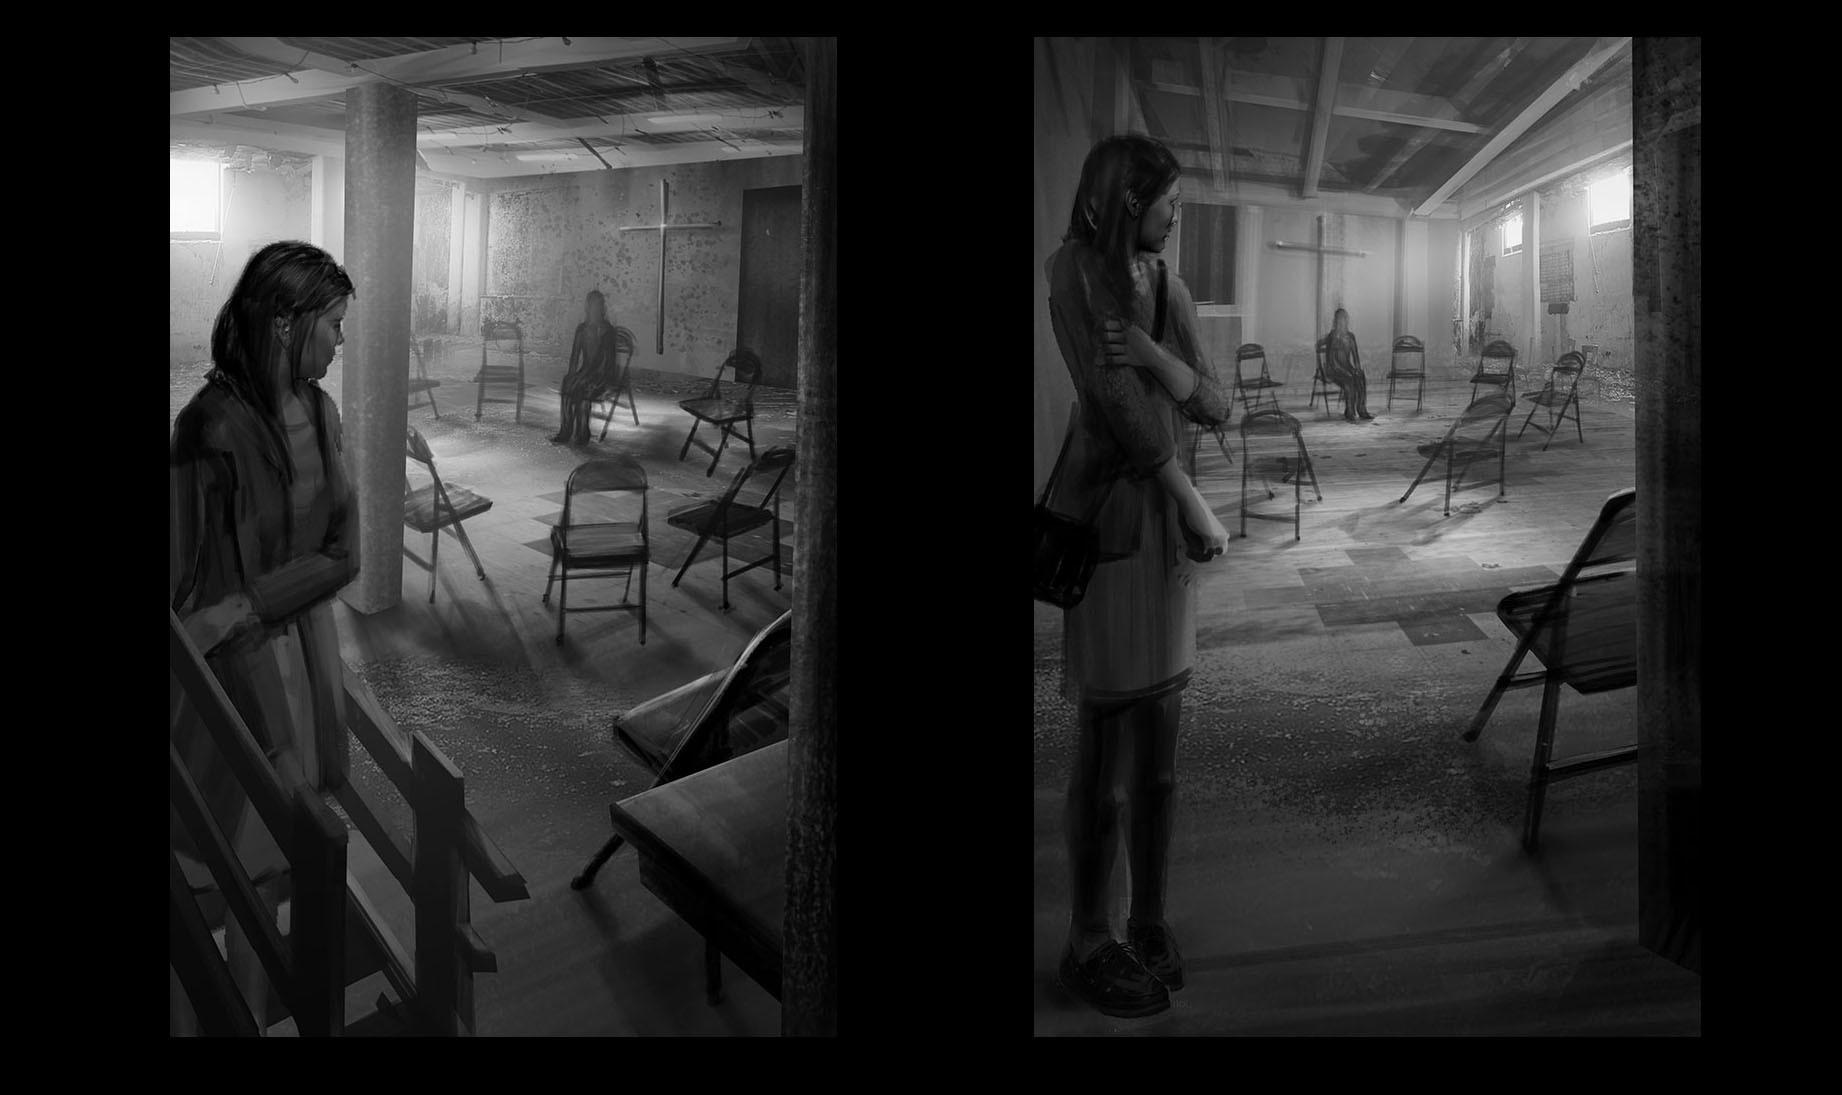 Jessica tung chi lee interior 1 sketches